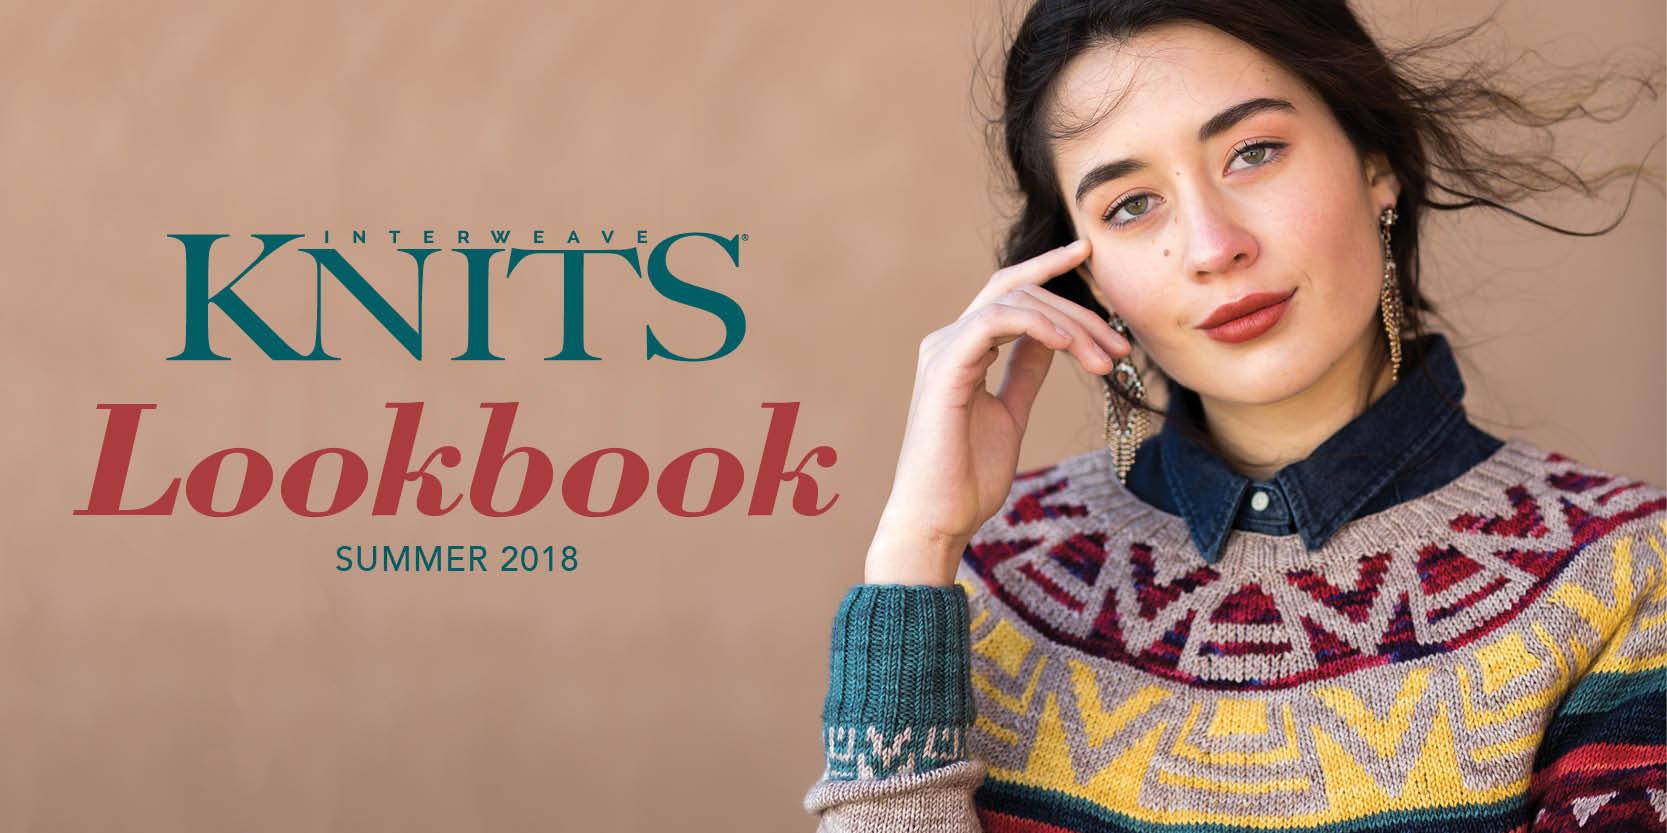 <em>Interweave Knits</em> Summer 2018 Lookbook